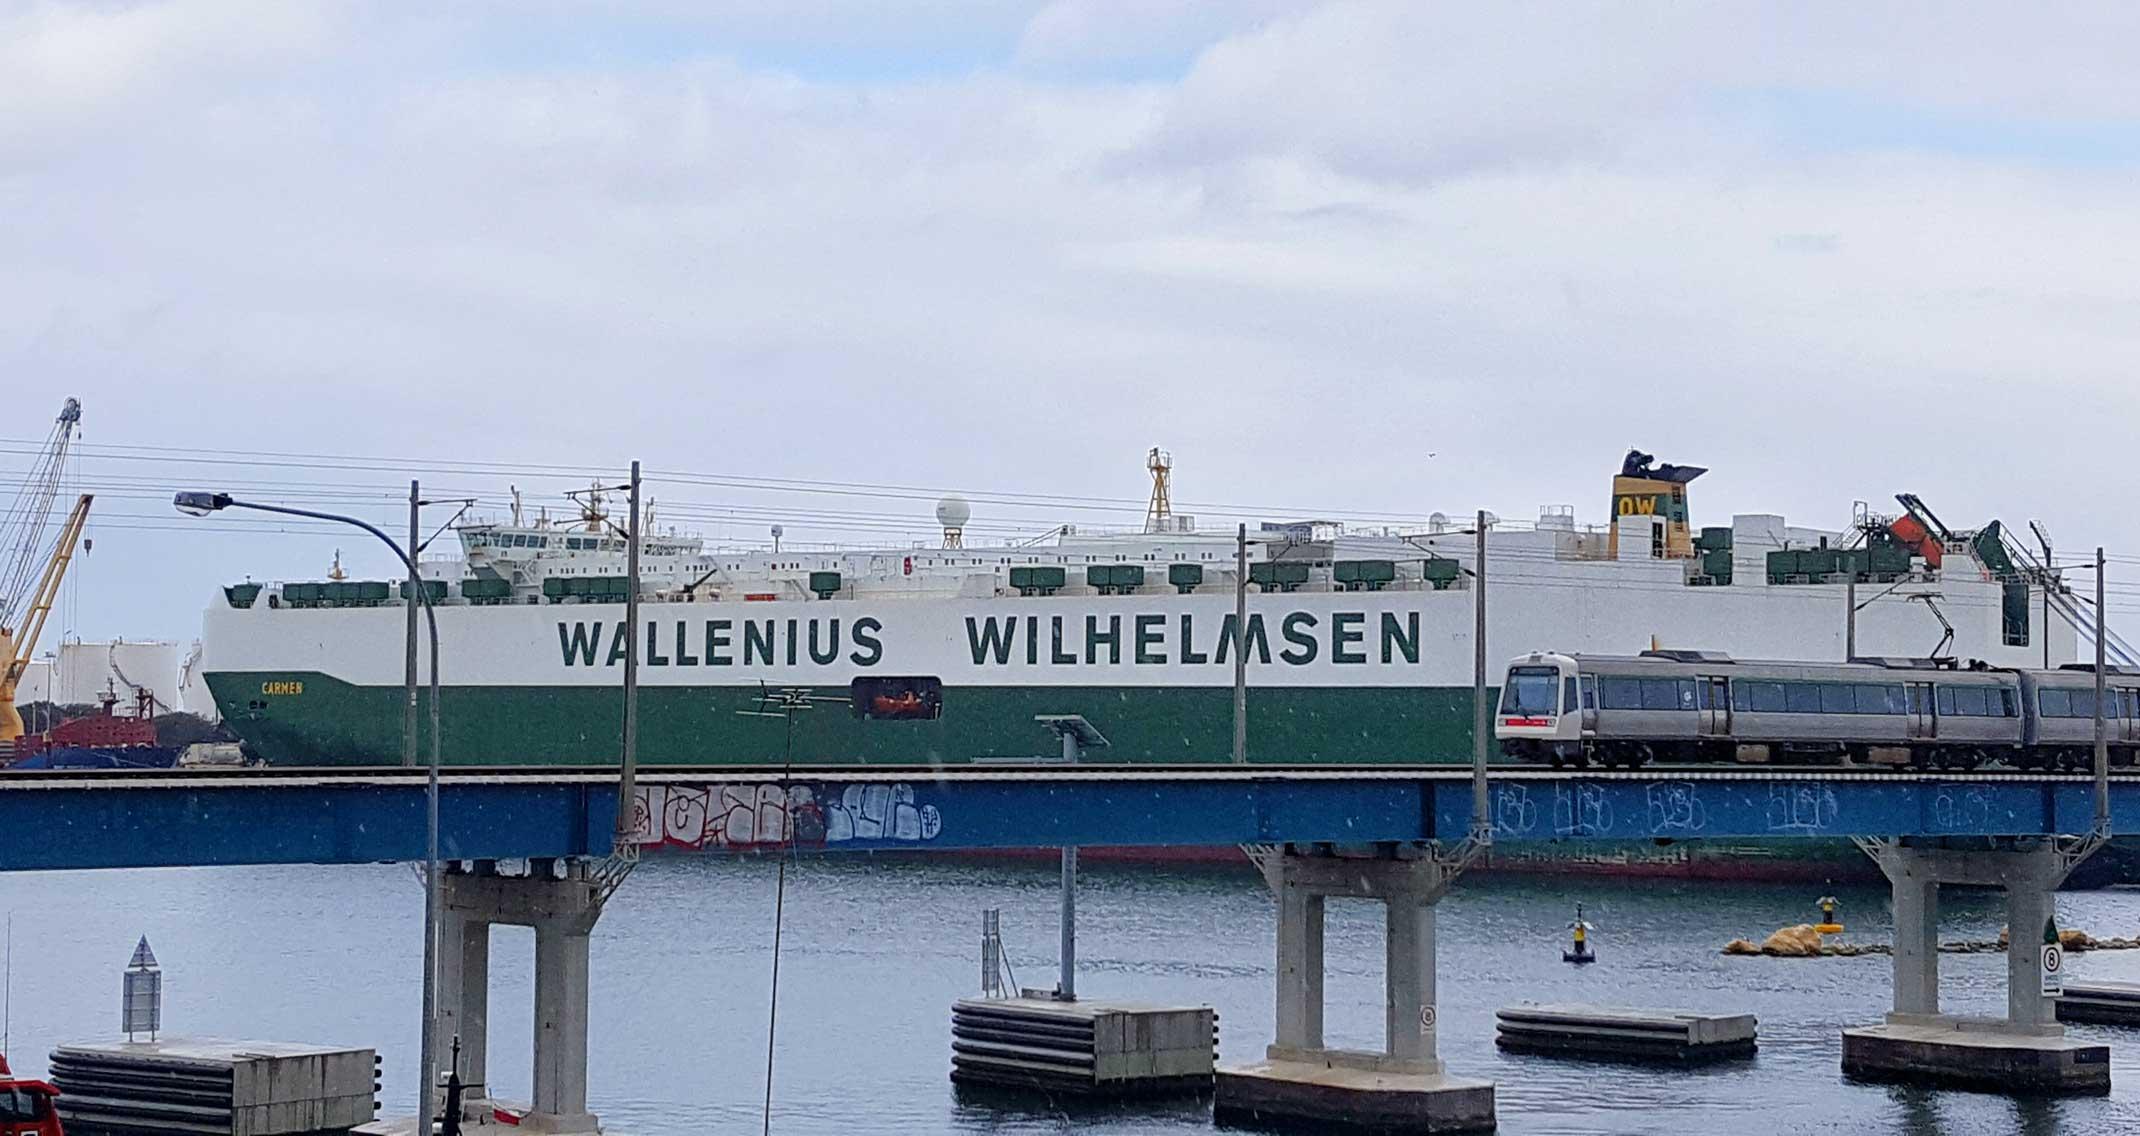 carmen-ship-sweden-fremantle-port